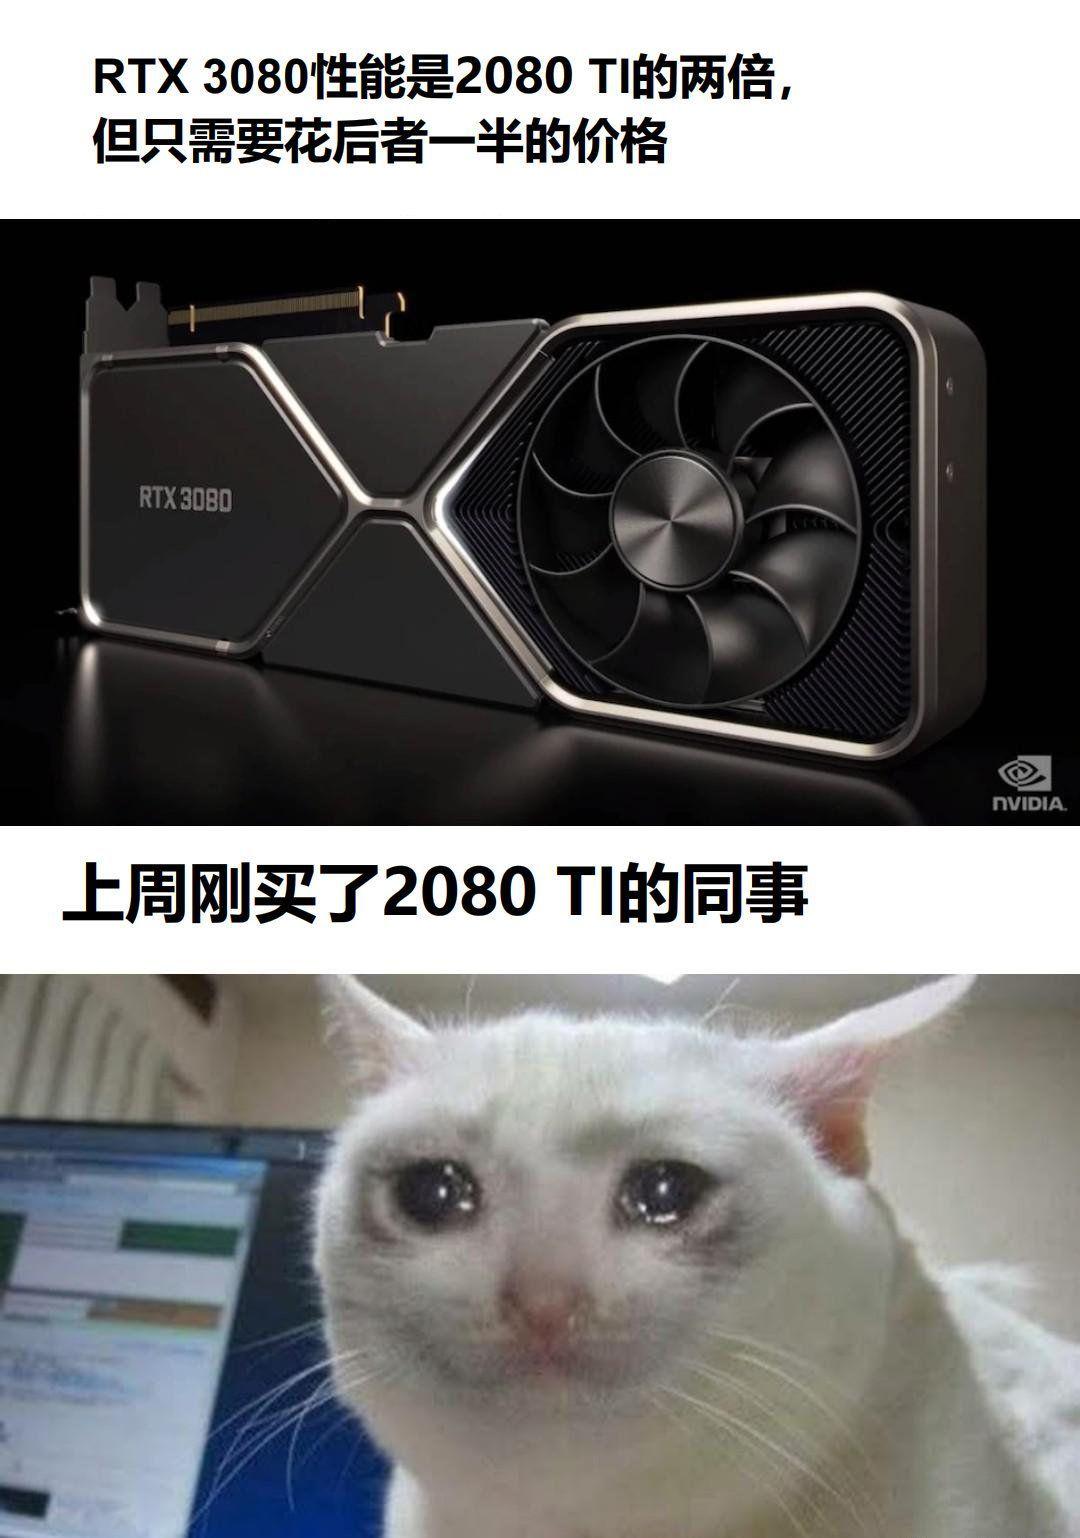 2080 TI